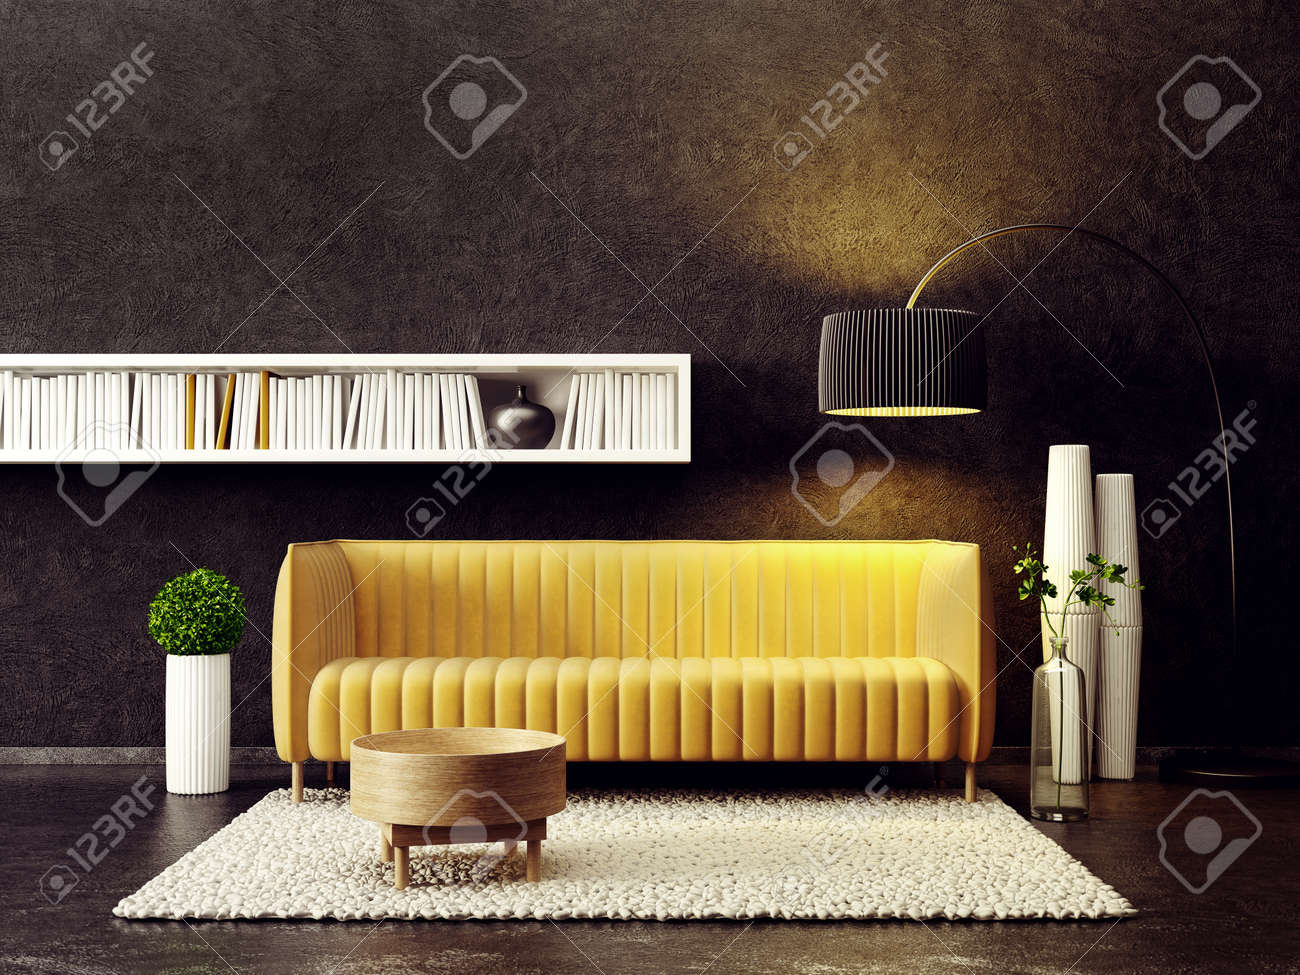 Salon moderne avec canapé jaune et lampe scandinave design scandinave  illustration de rendu 3d